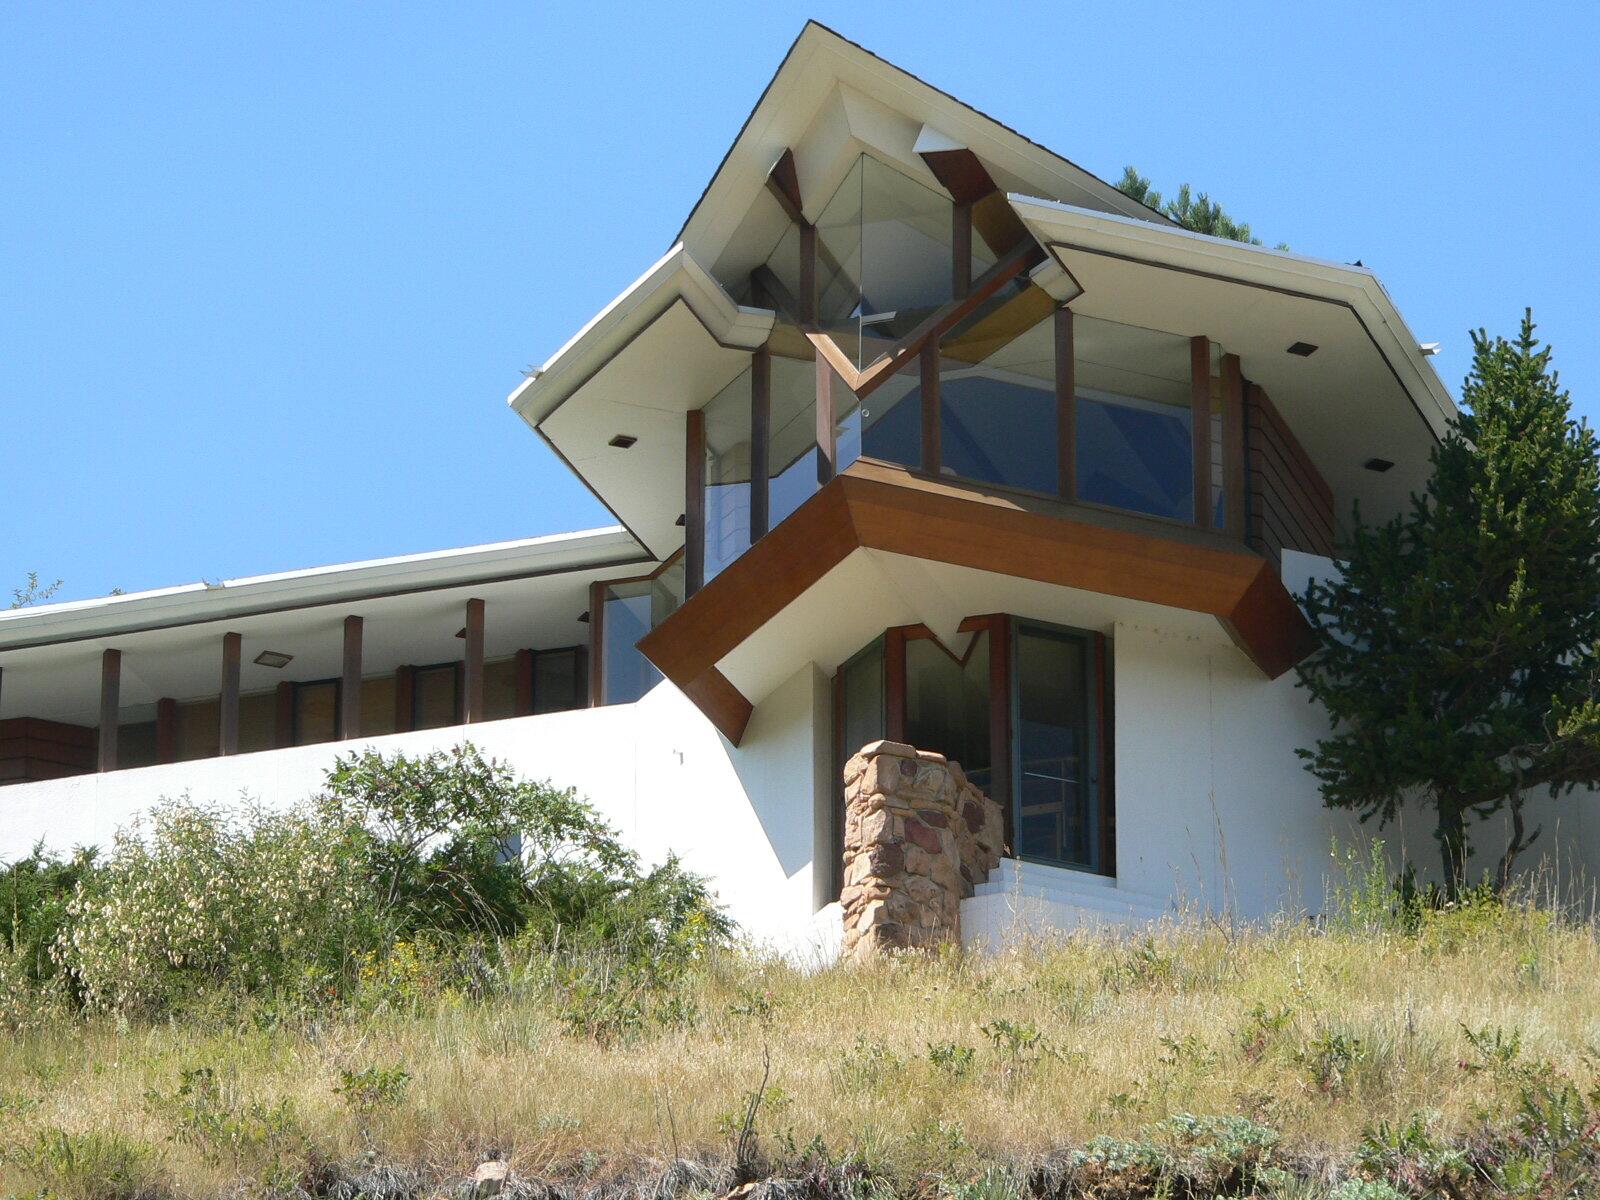 Willard House, 1963, projecting Living Room